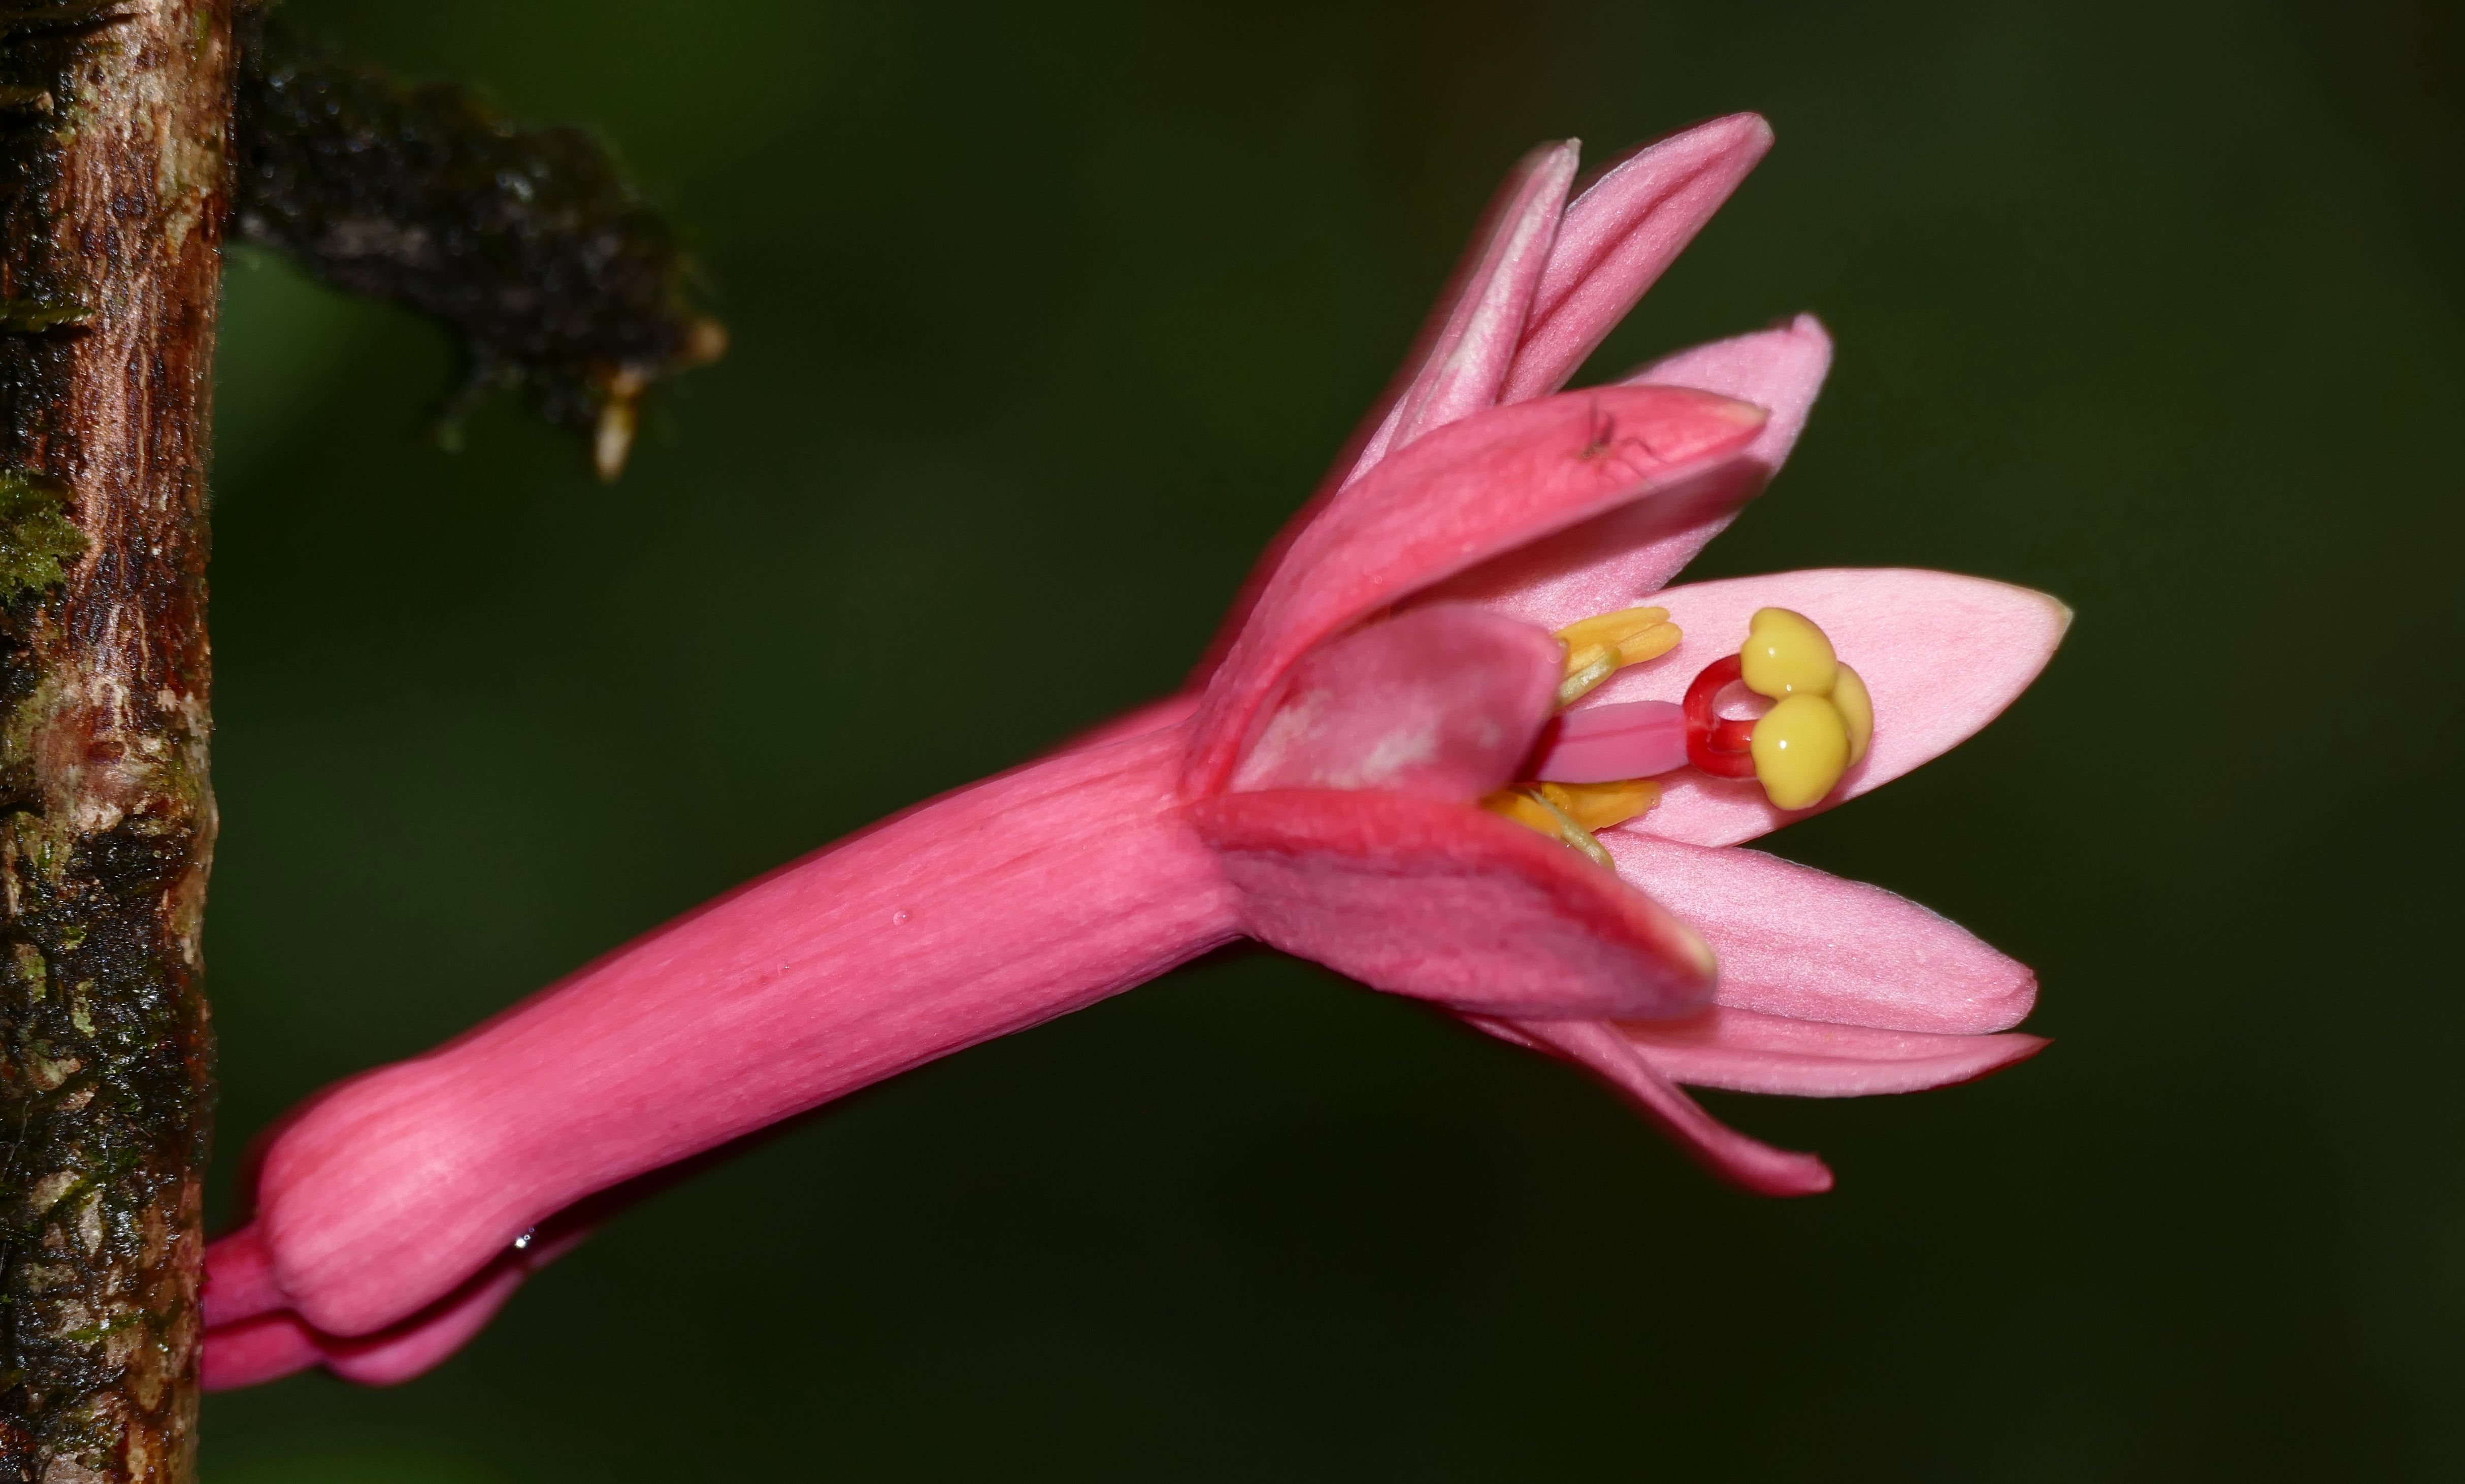 Filepink passion flower passiflora amoena 39555315542g filepink passion flower passiflora amoena 39555315542g mightylinksfo